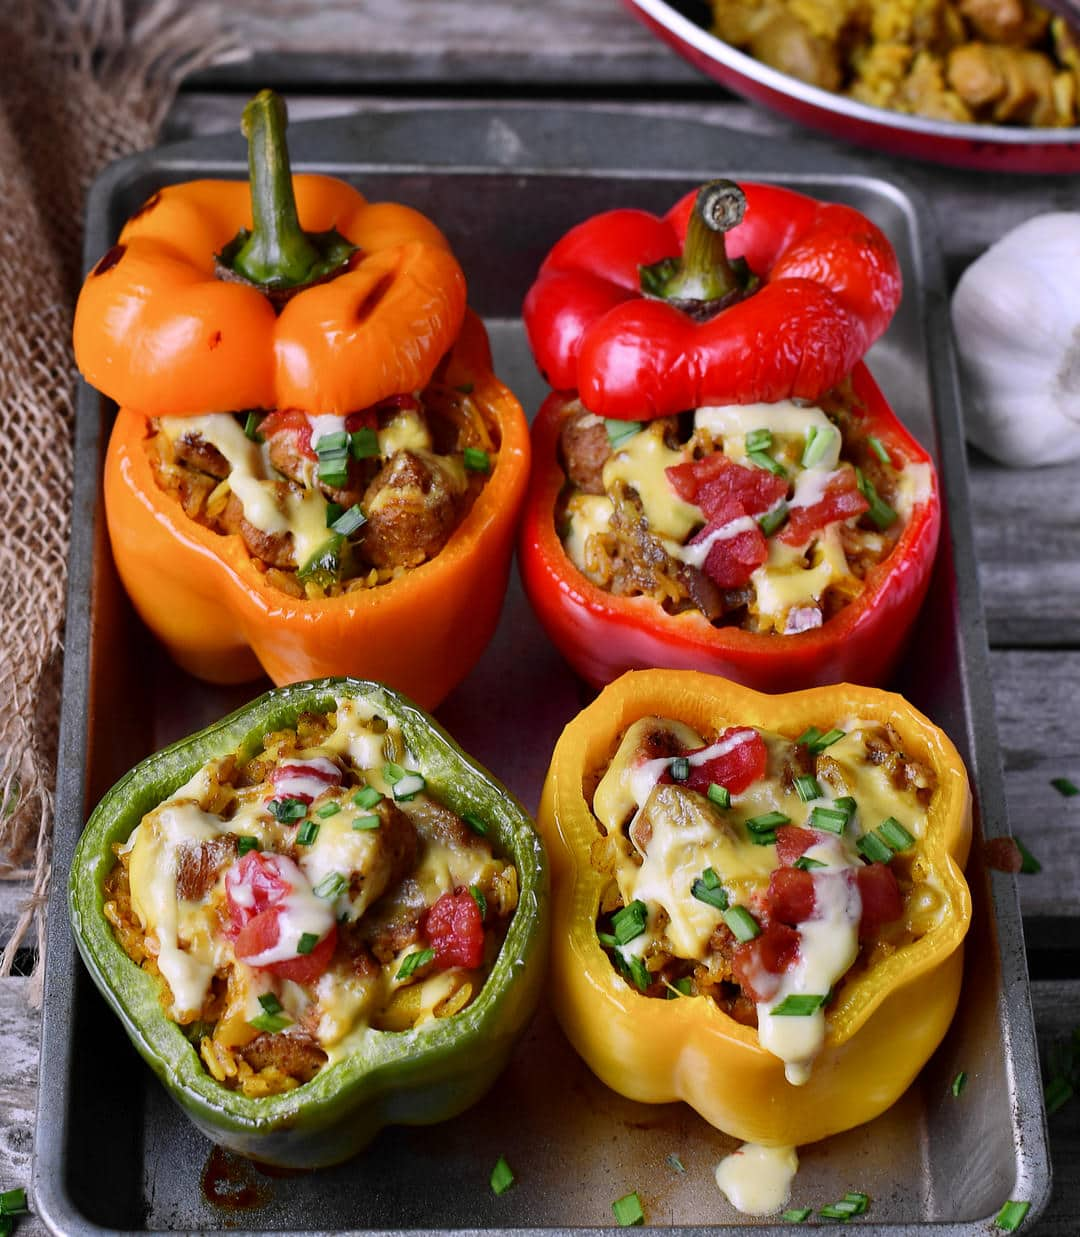 4 gefüllte Paprikas mit Reis, Gemüse und veganem Käse